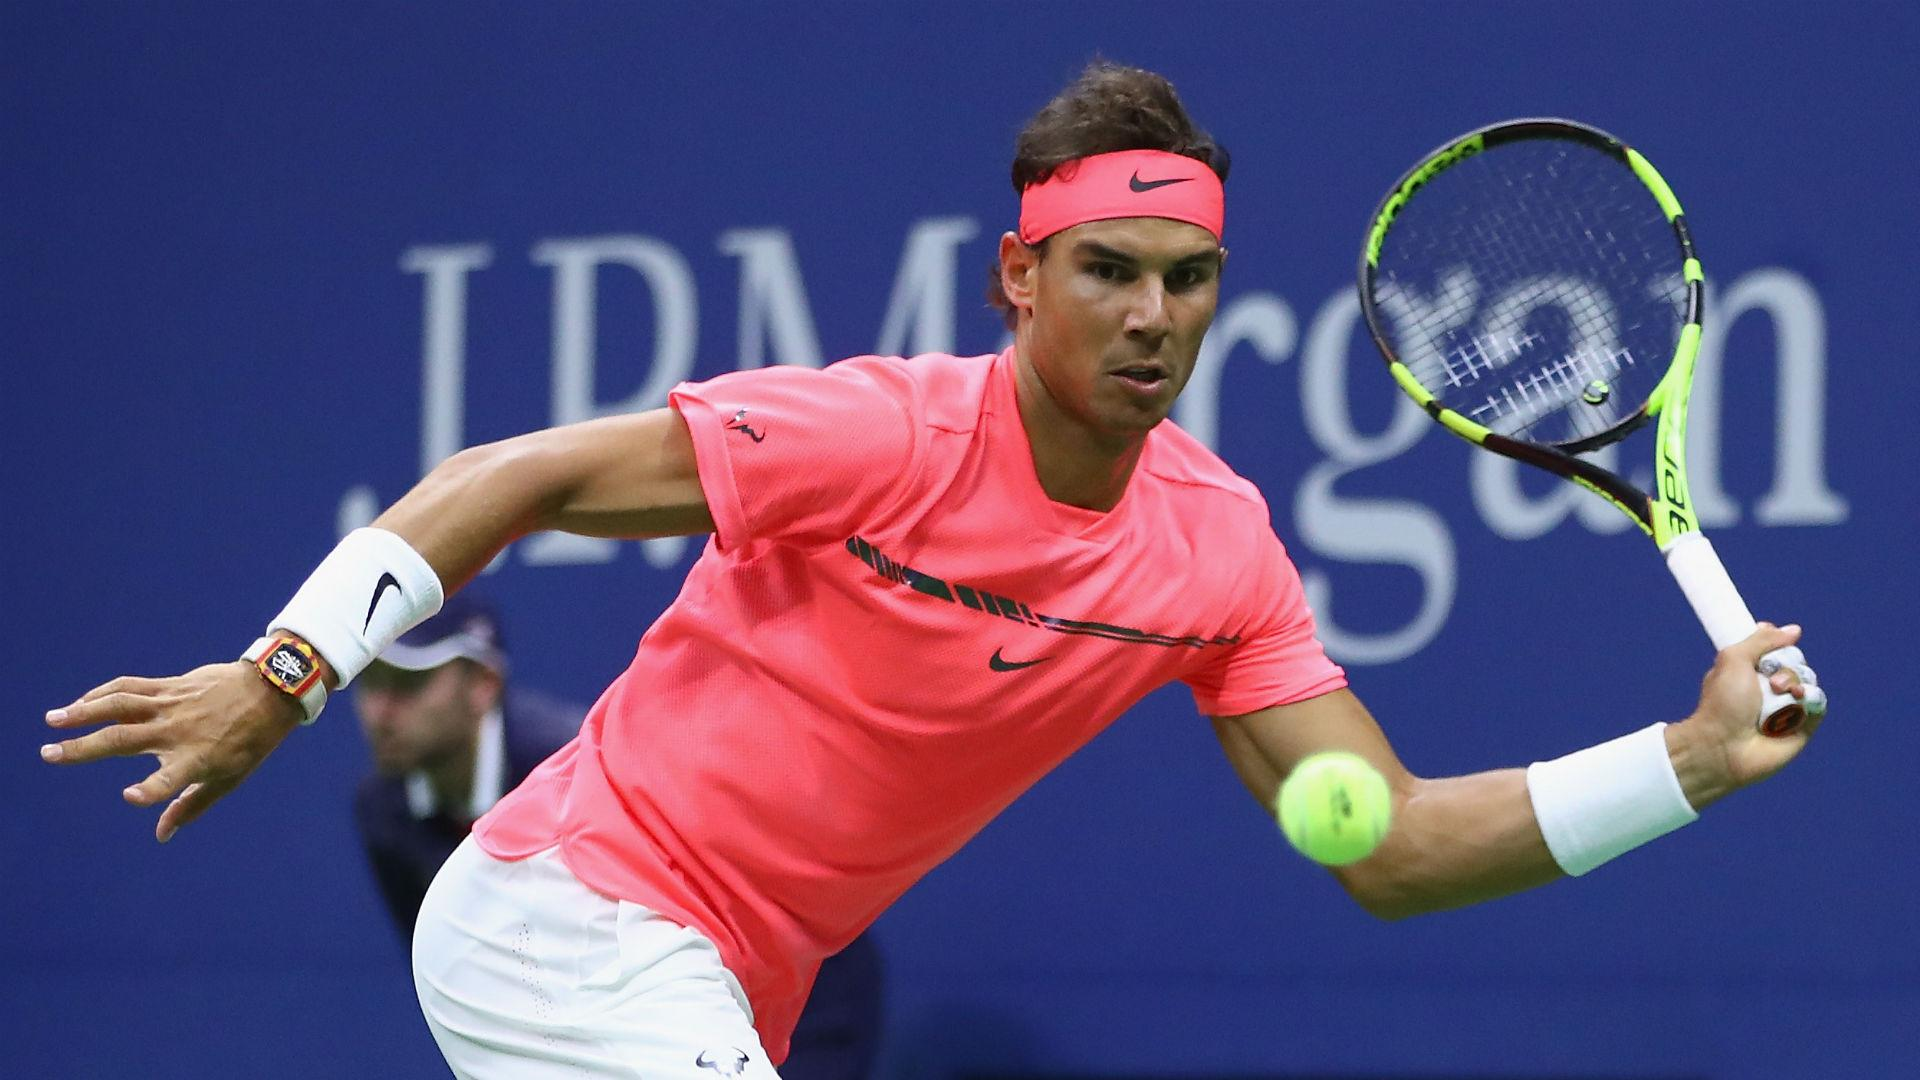 U S Open 2017 Rafael Nadal Cruises To Set Up Possible Semi Vs Roger Federer